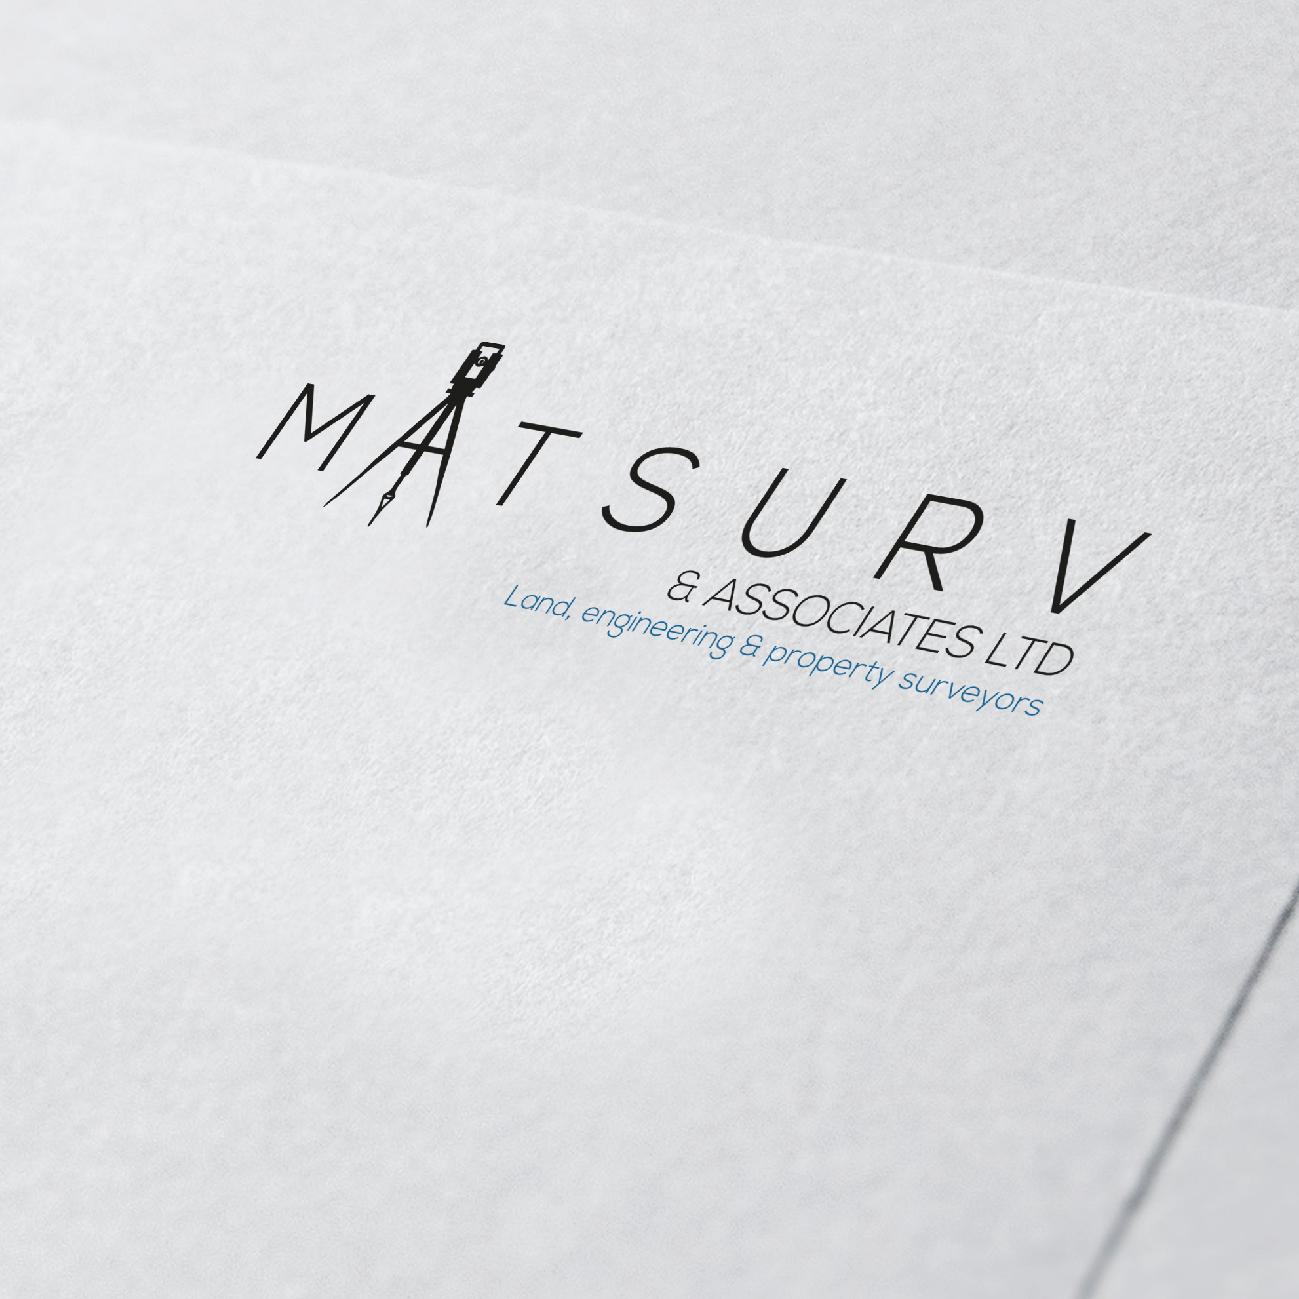 matsurv branding